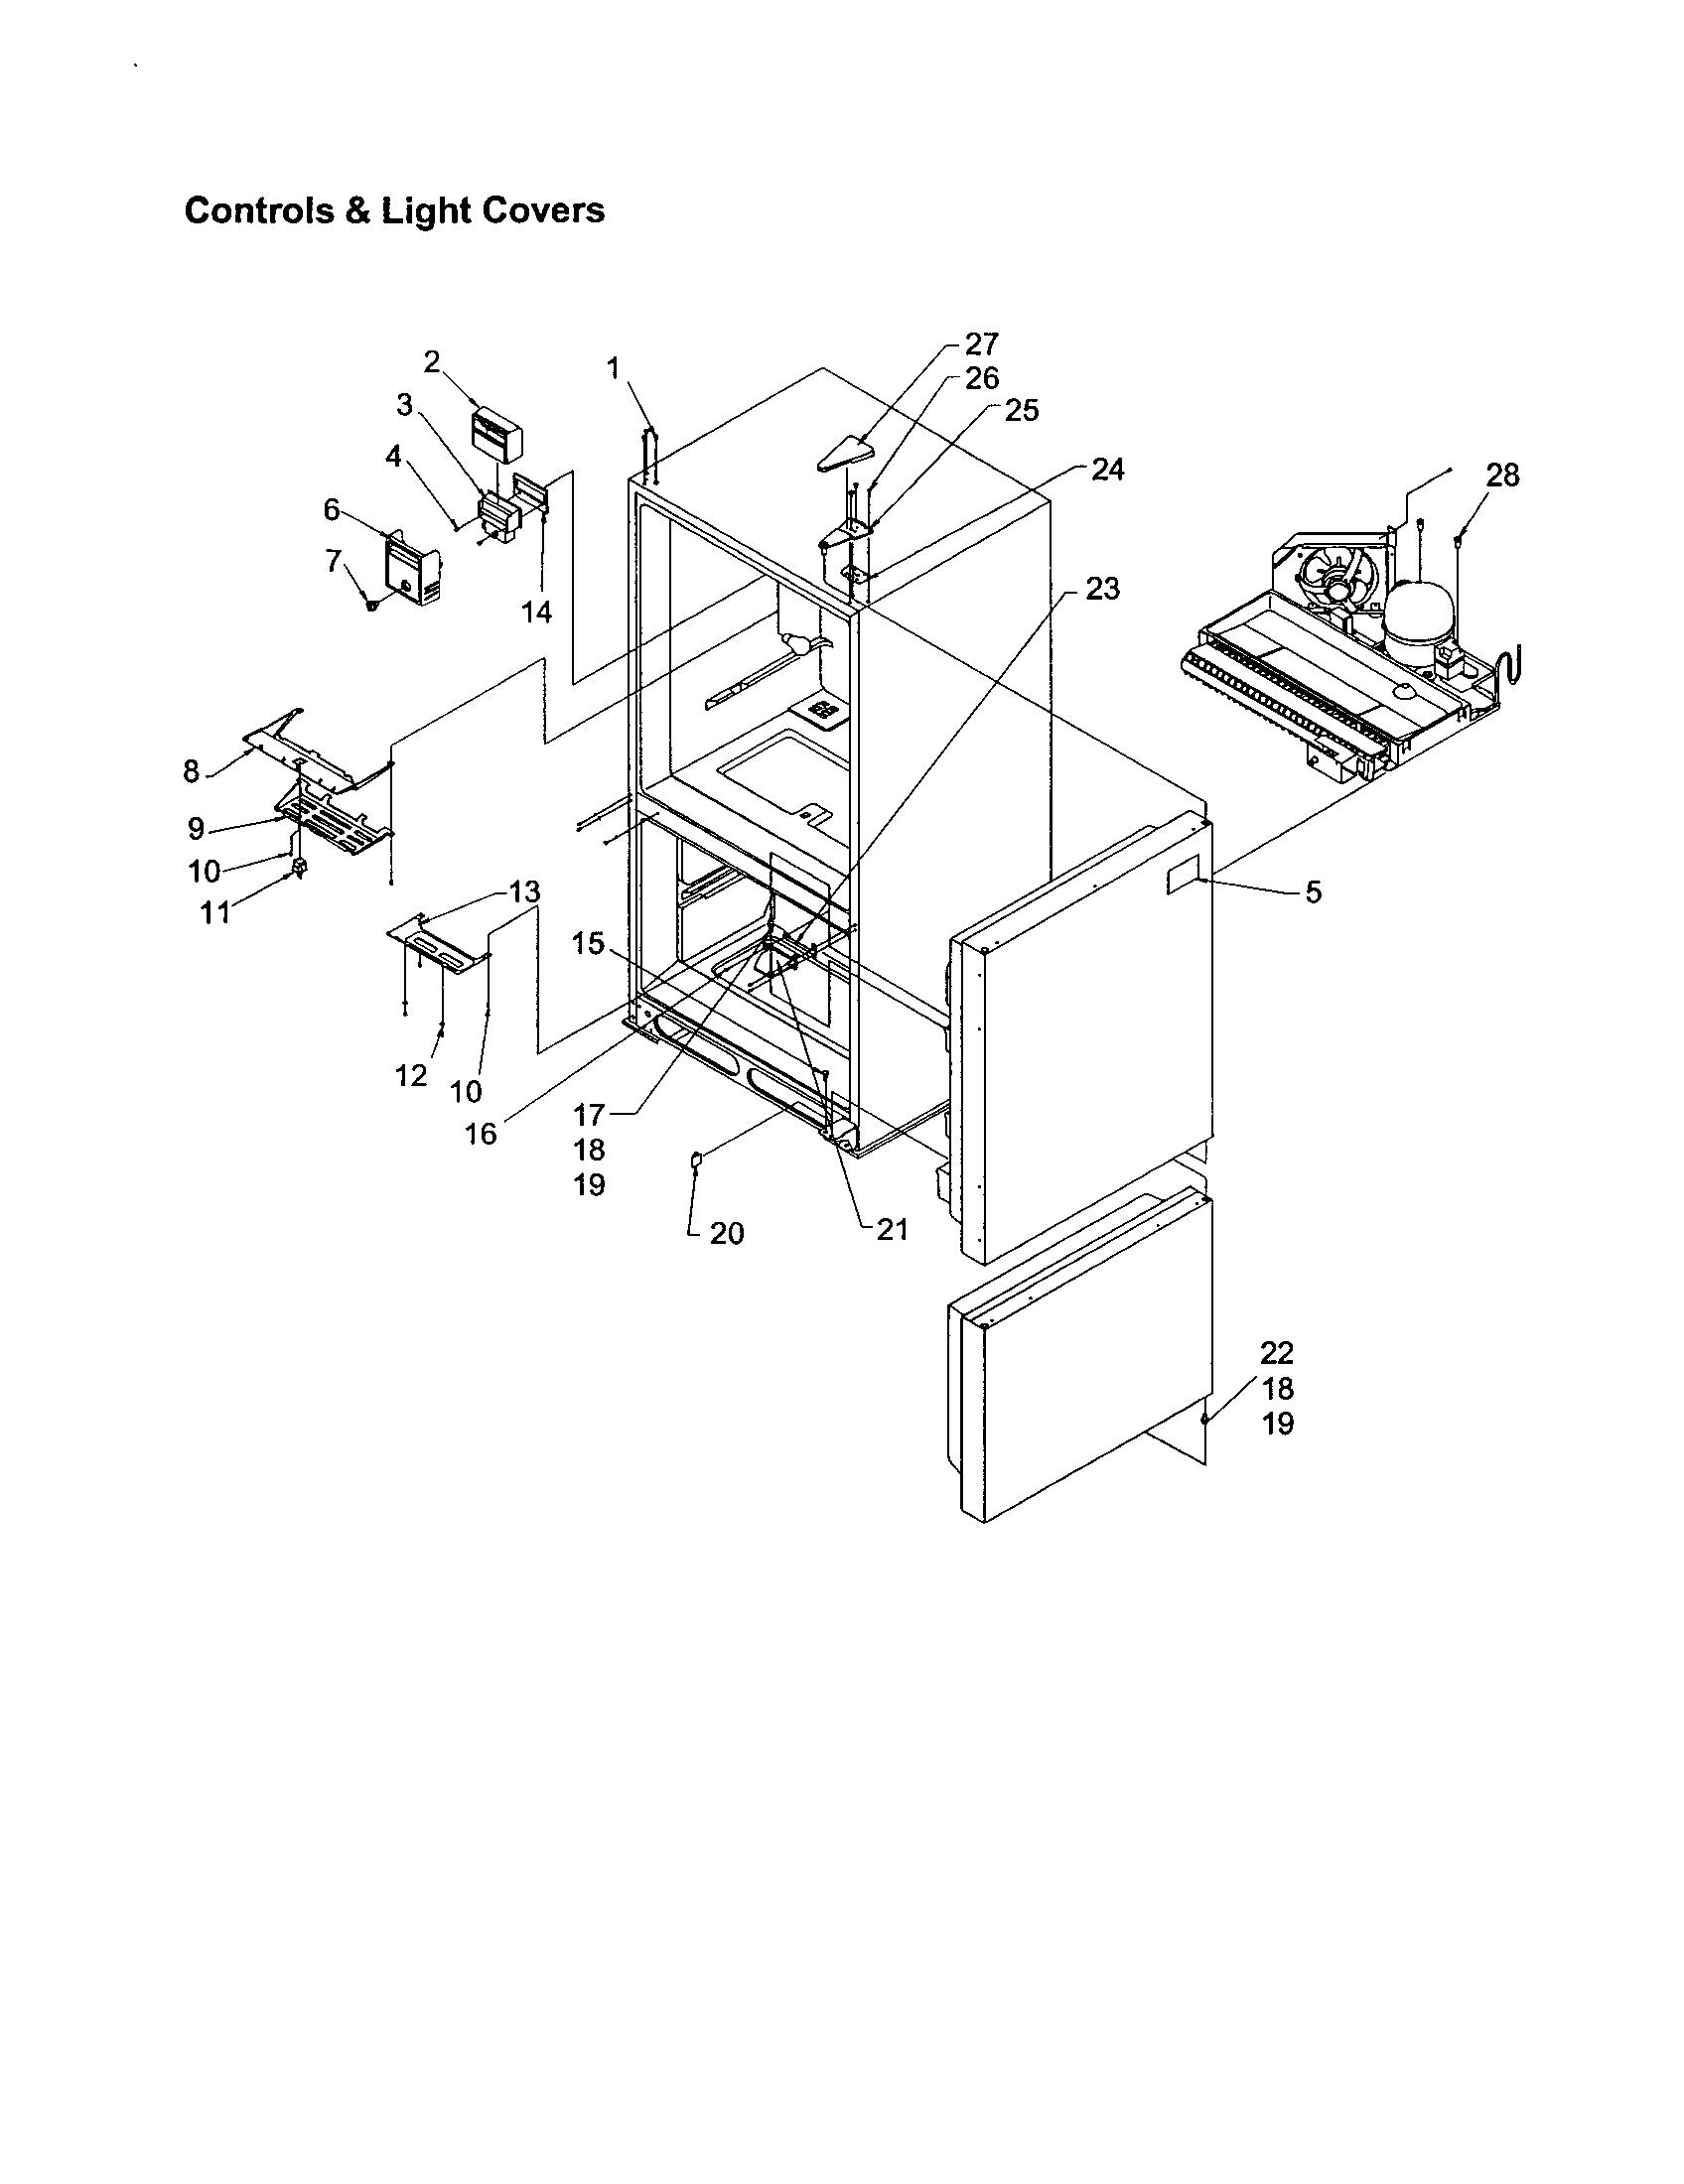 CONTROLS/LIGHT COVERS Diagram & Parts List for Model